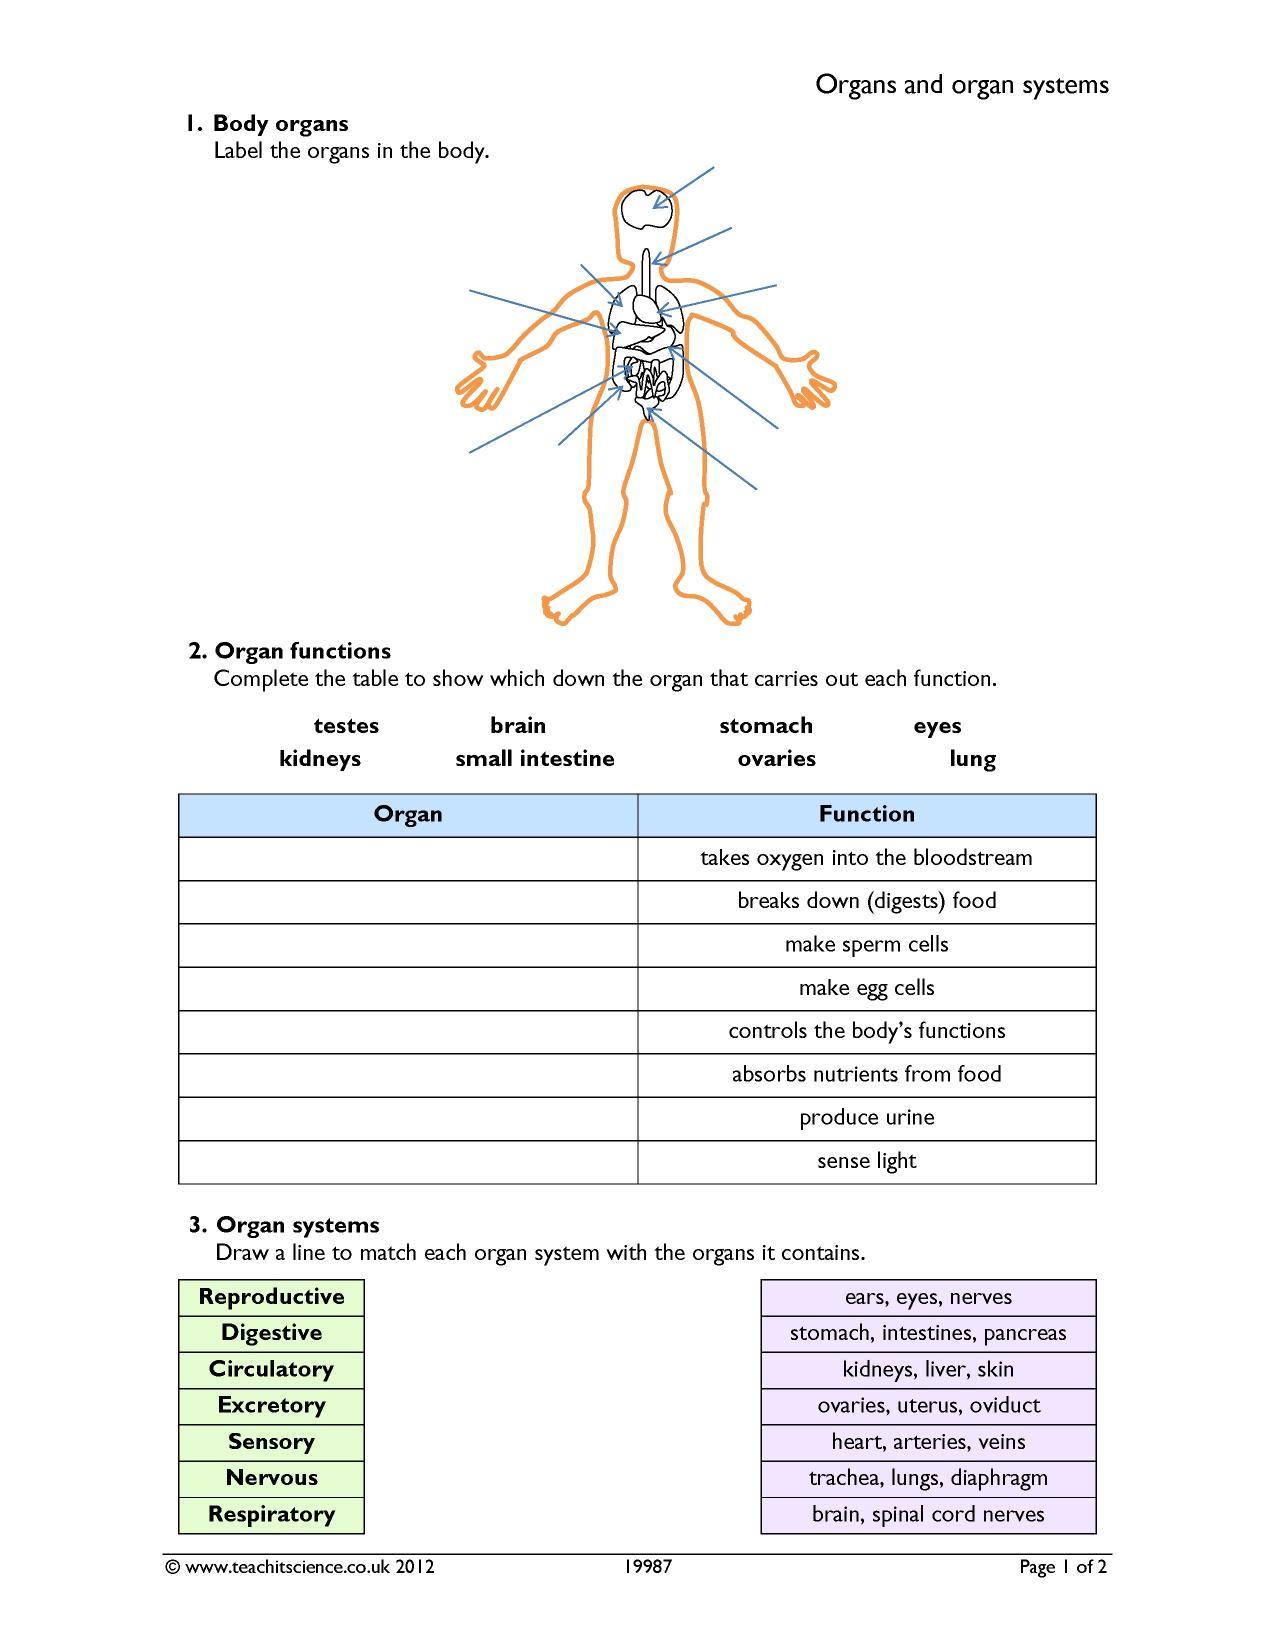 organs and organ systems human biology ks3 all ks3 resources ks3 science resources. Black Bedroom Furniture Sets. Home Design Ideas